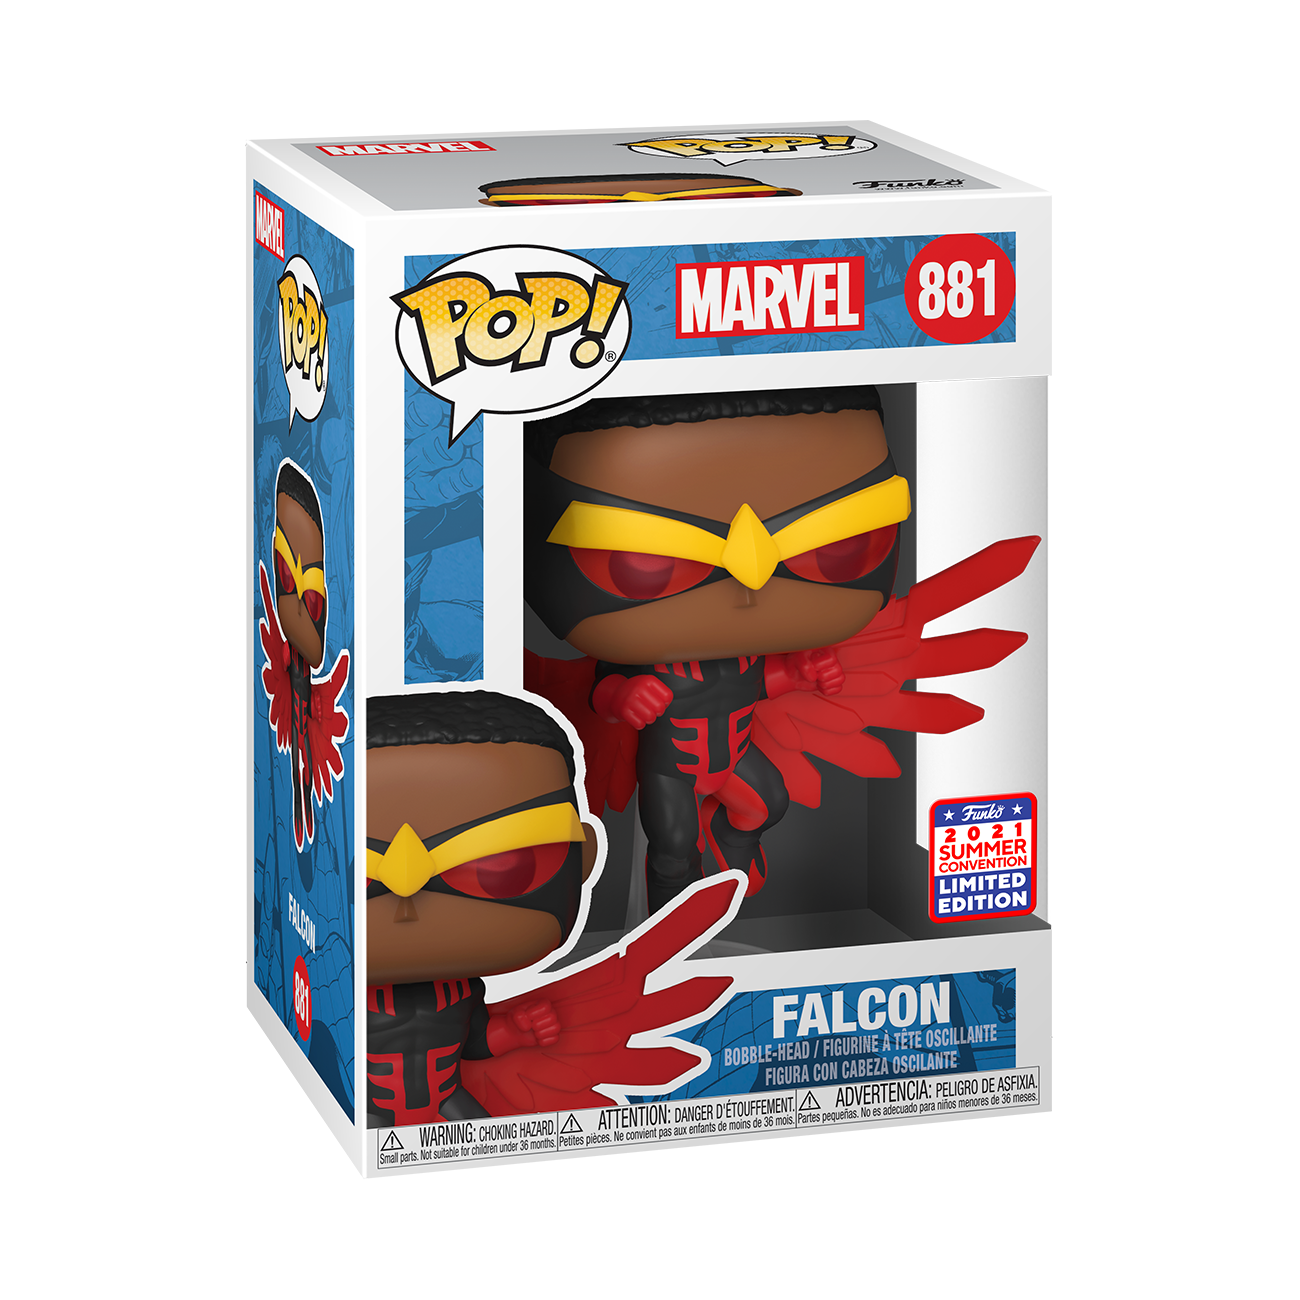 Marvel - Falcon Pop! Vinyl Figure